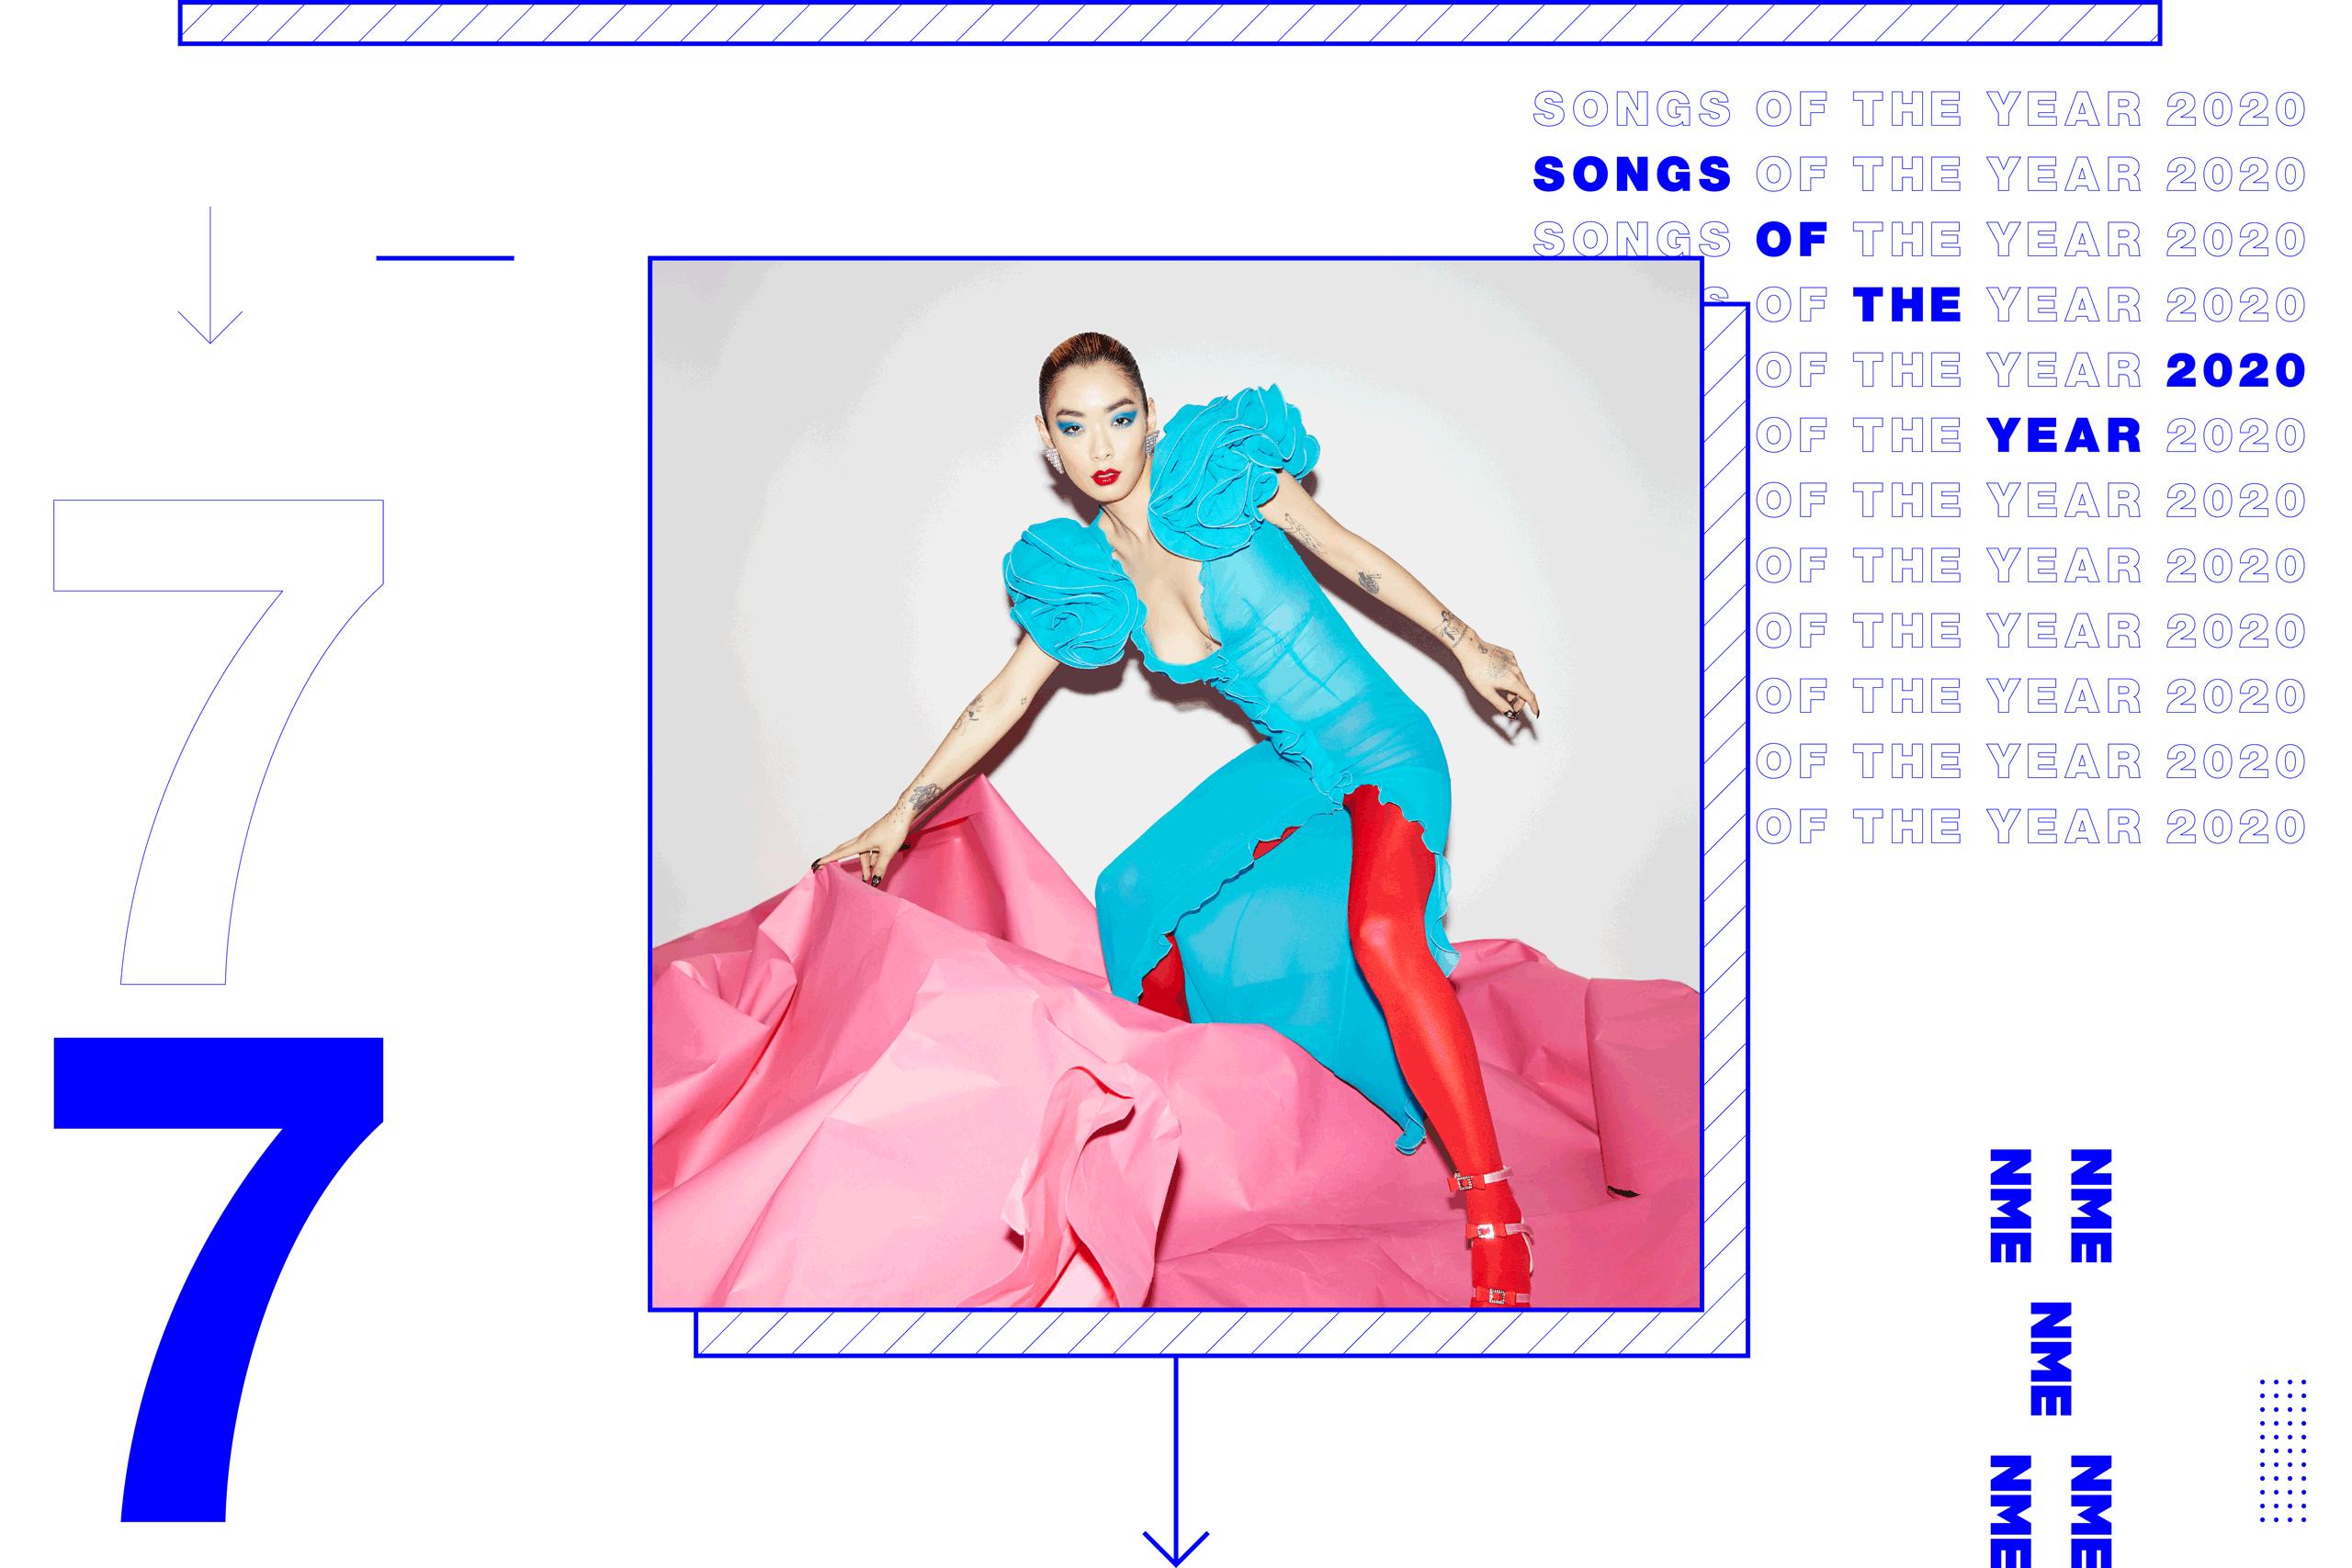 nme songs of the year Rina Sawayama – 'XS